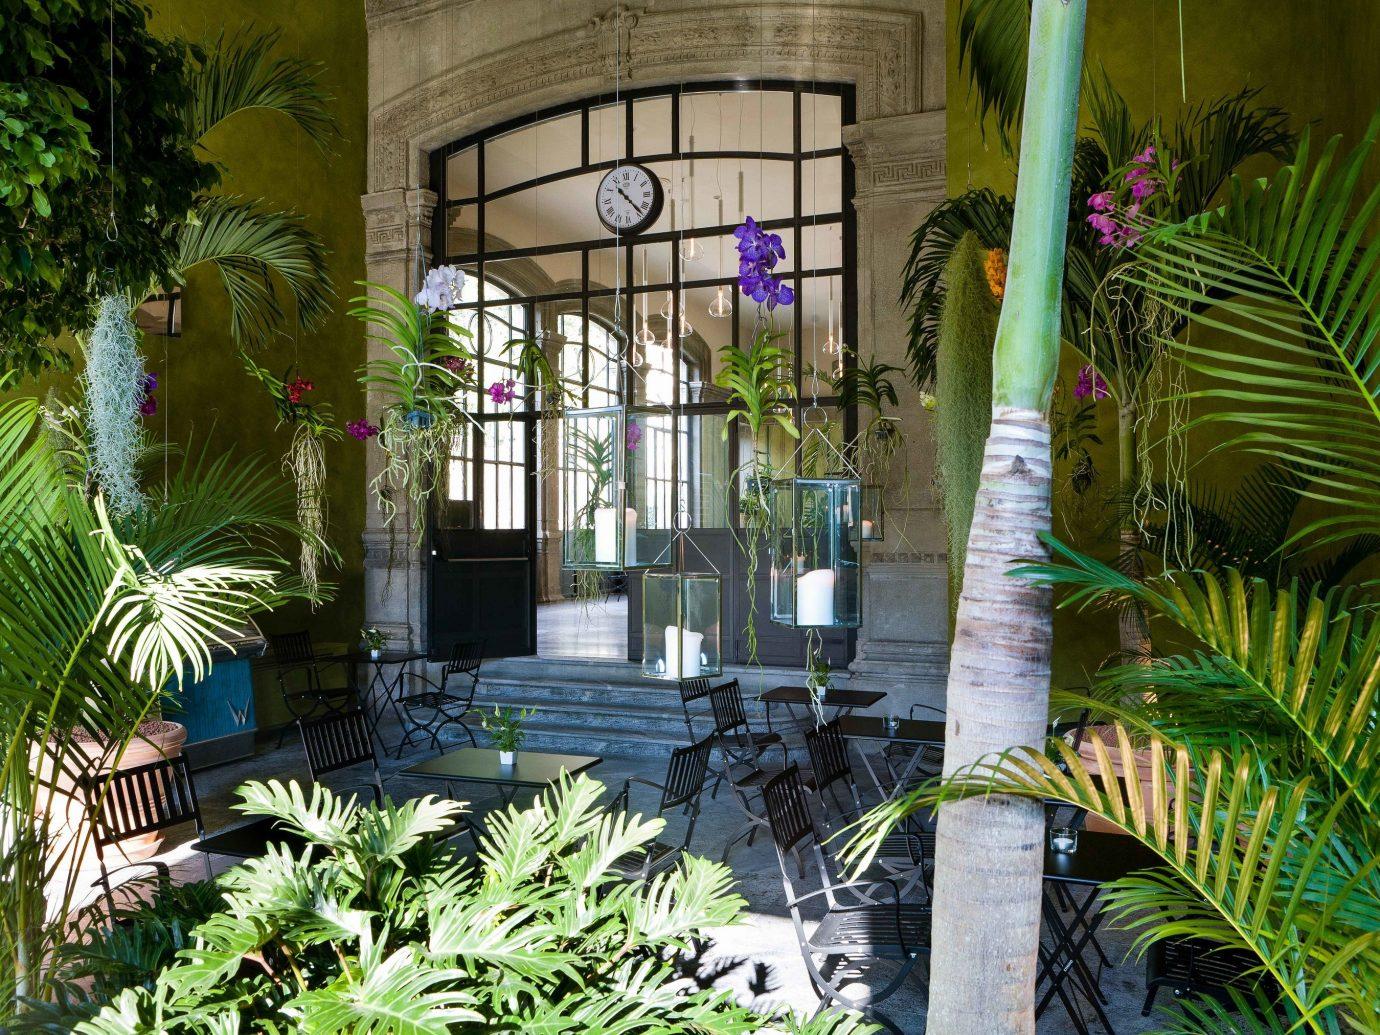 Arts + Culture Italy Milan property arecales palm tree plant Courtyard home tree outdoor structure house real estate hacienda estate Garden condominium